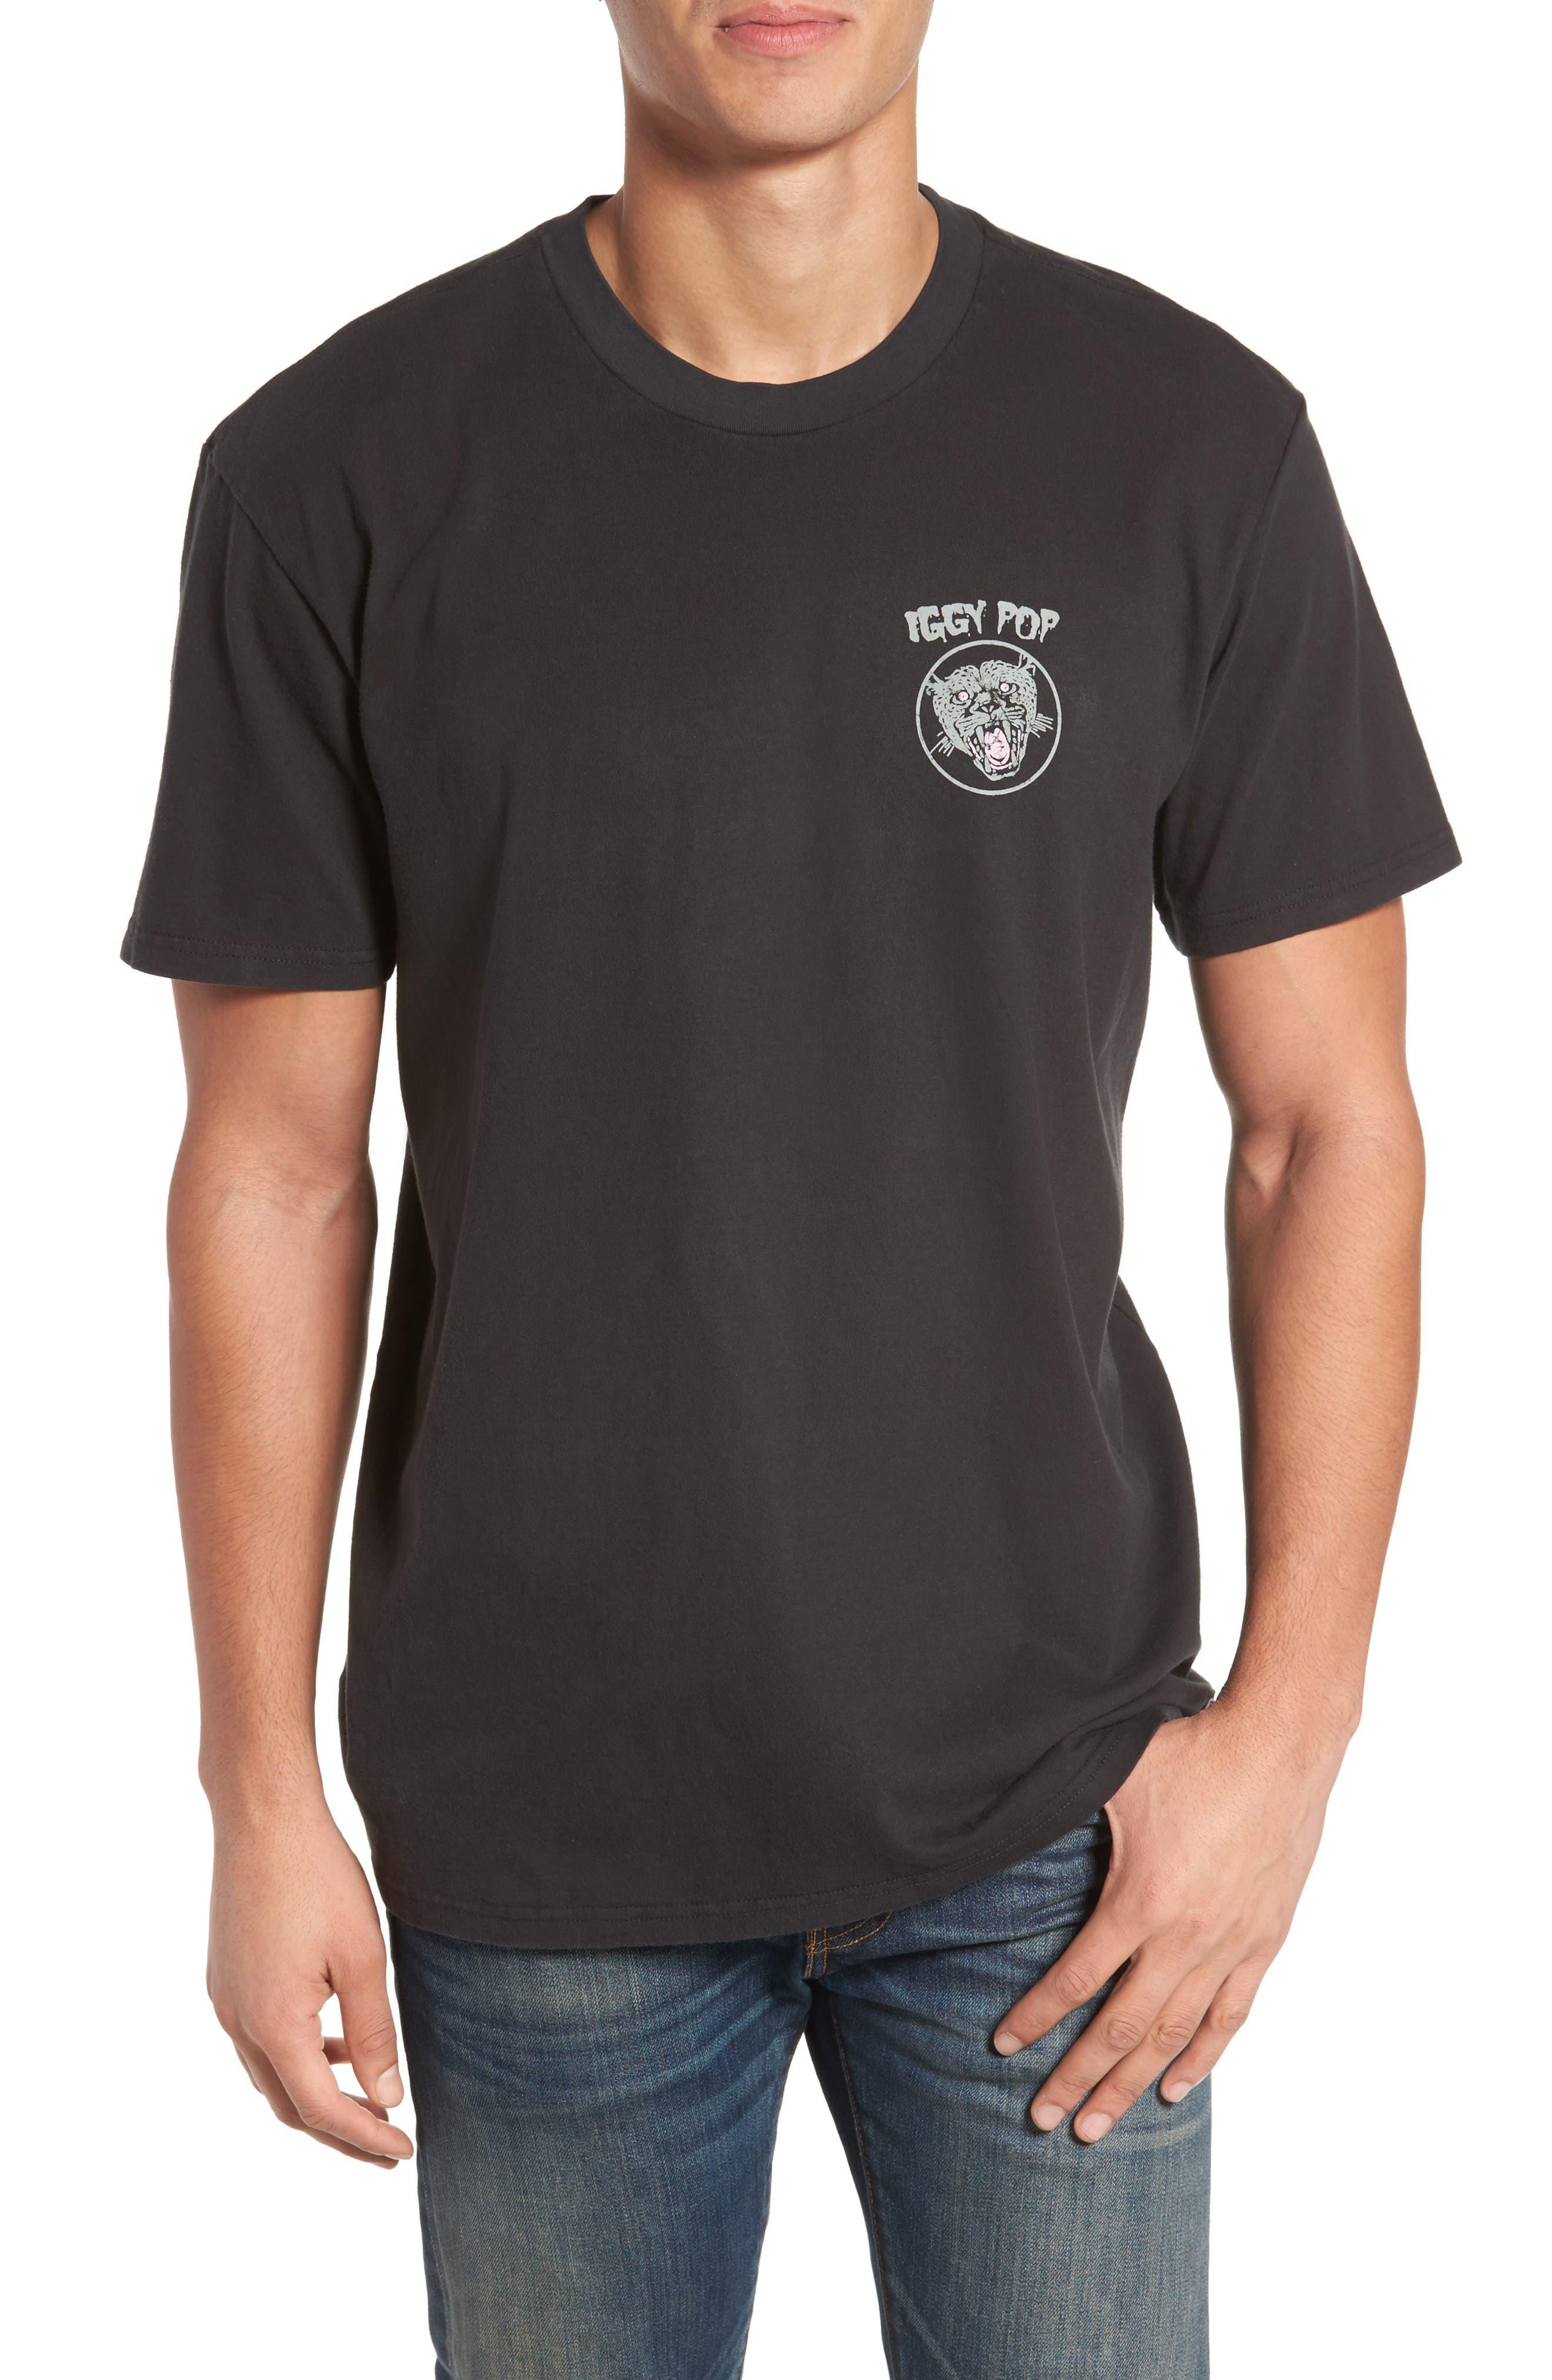 Alternate Image 1 Selected - Billabong x Iggy Pop Iggy Stack T-Shirt